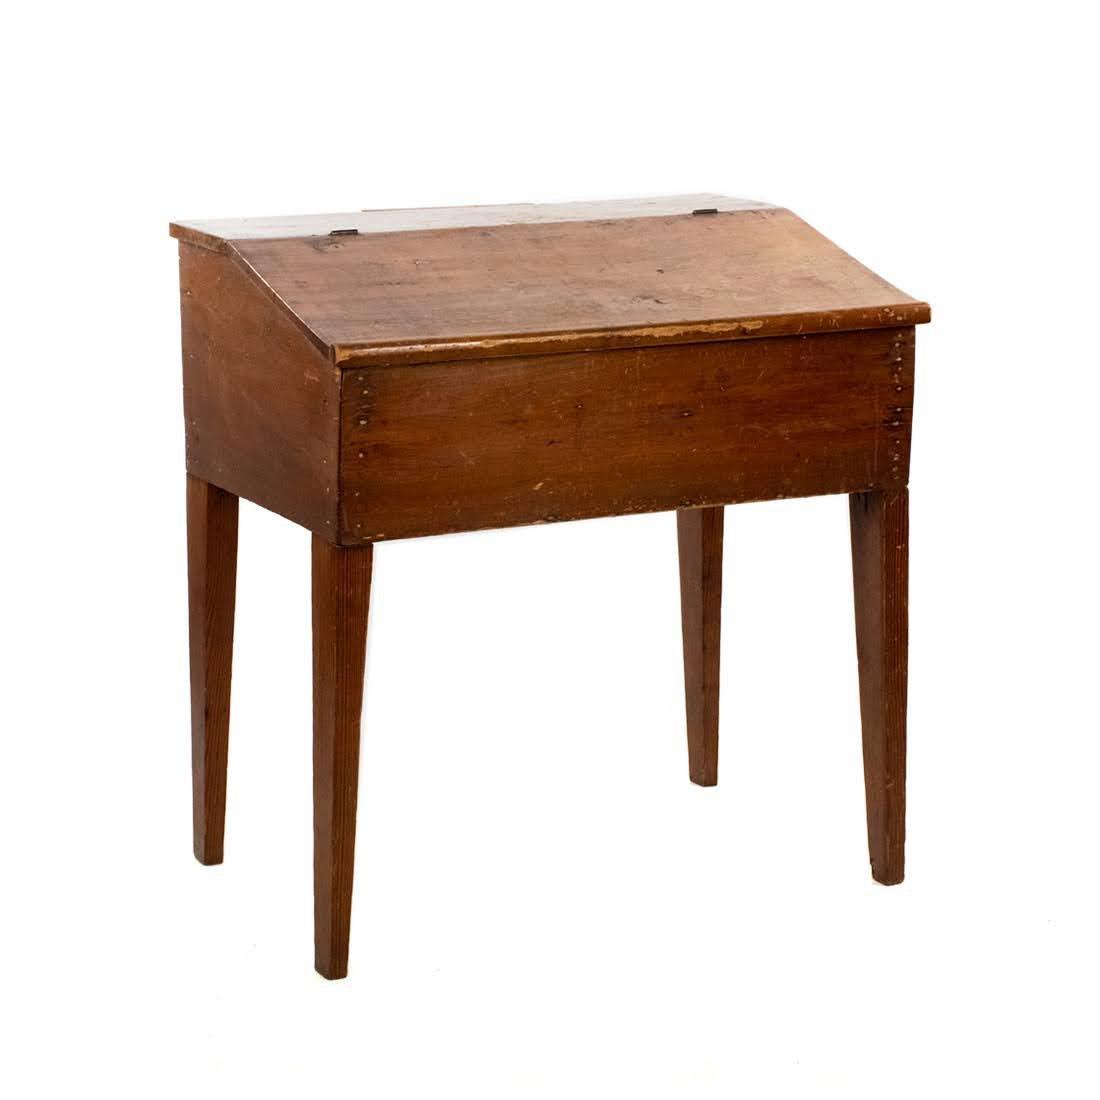 19th Century Pine Slant Top Desk